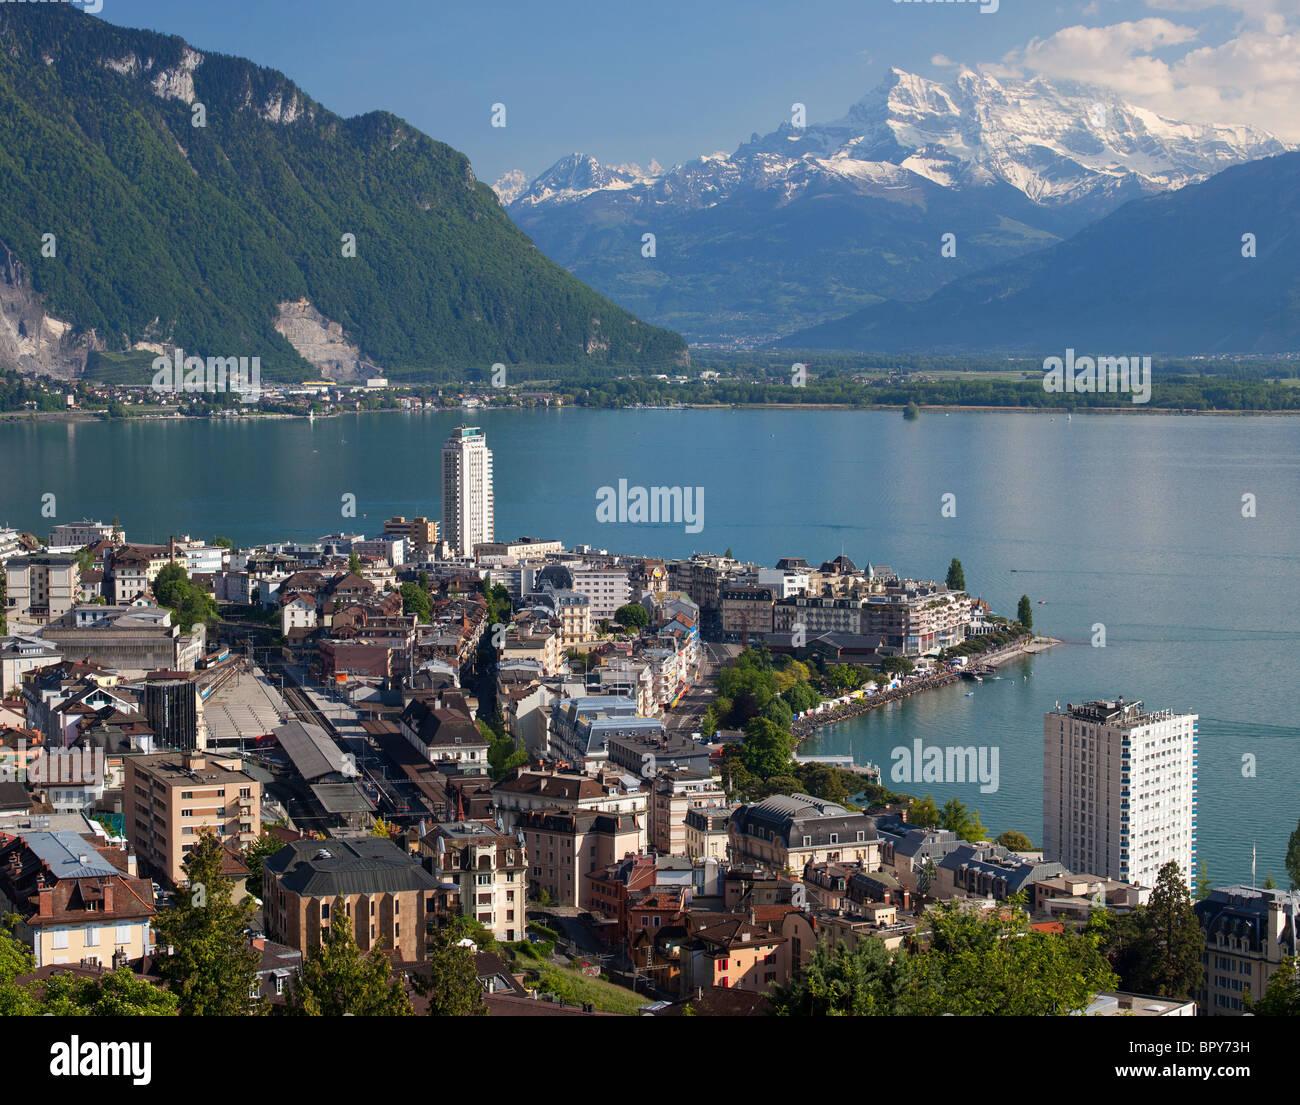 Montreux, Switzerland - Stock Image